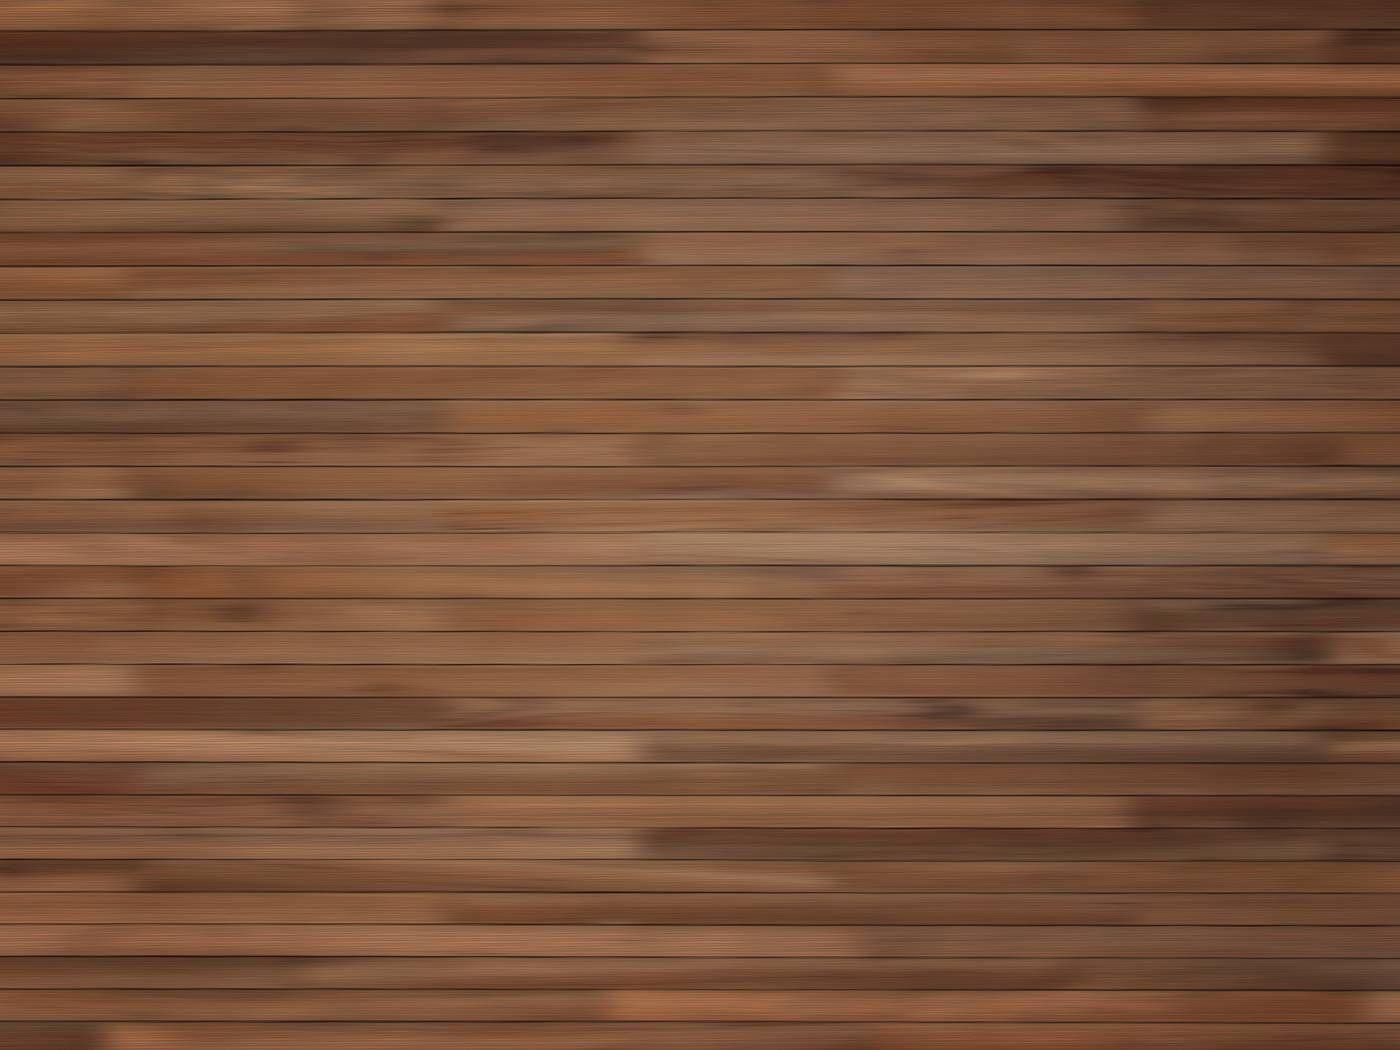 Wood School Desk Texture Wood Wallpaper Wood School Picture On Wood